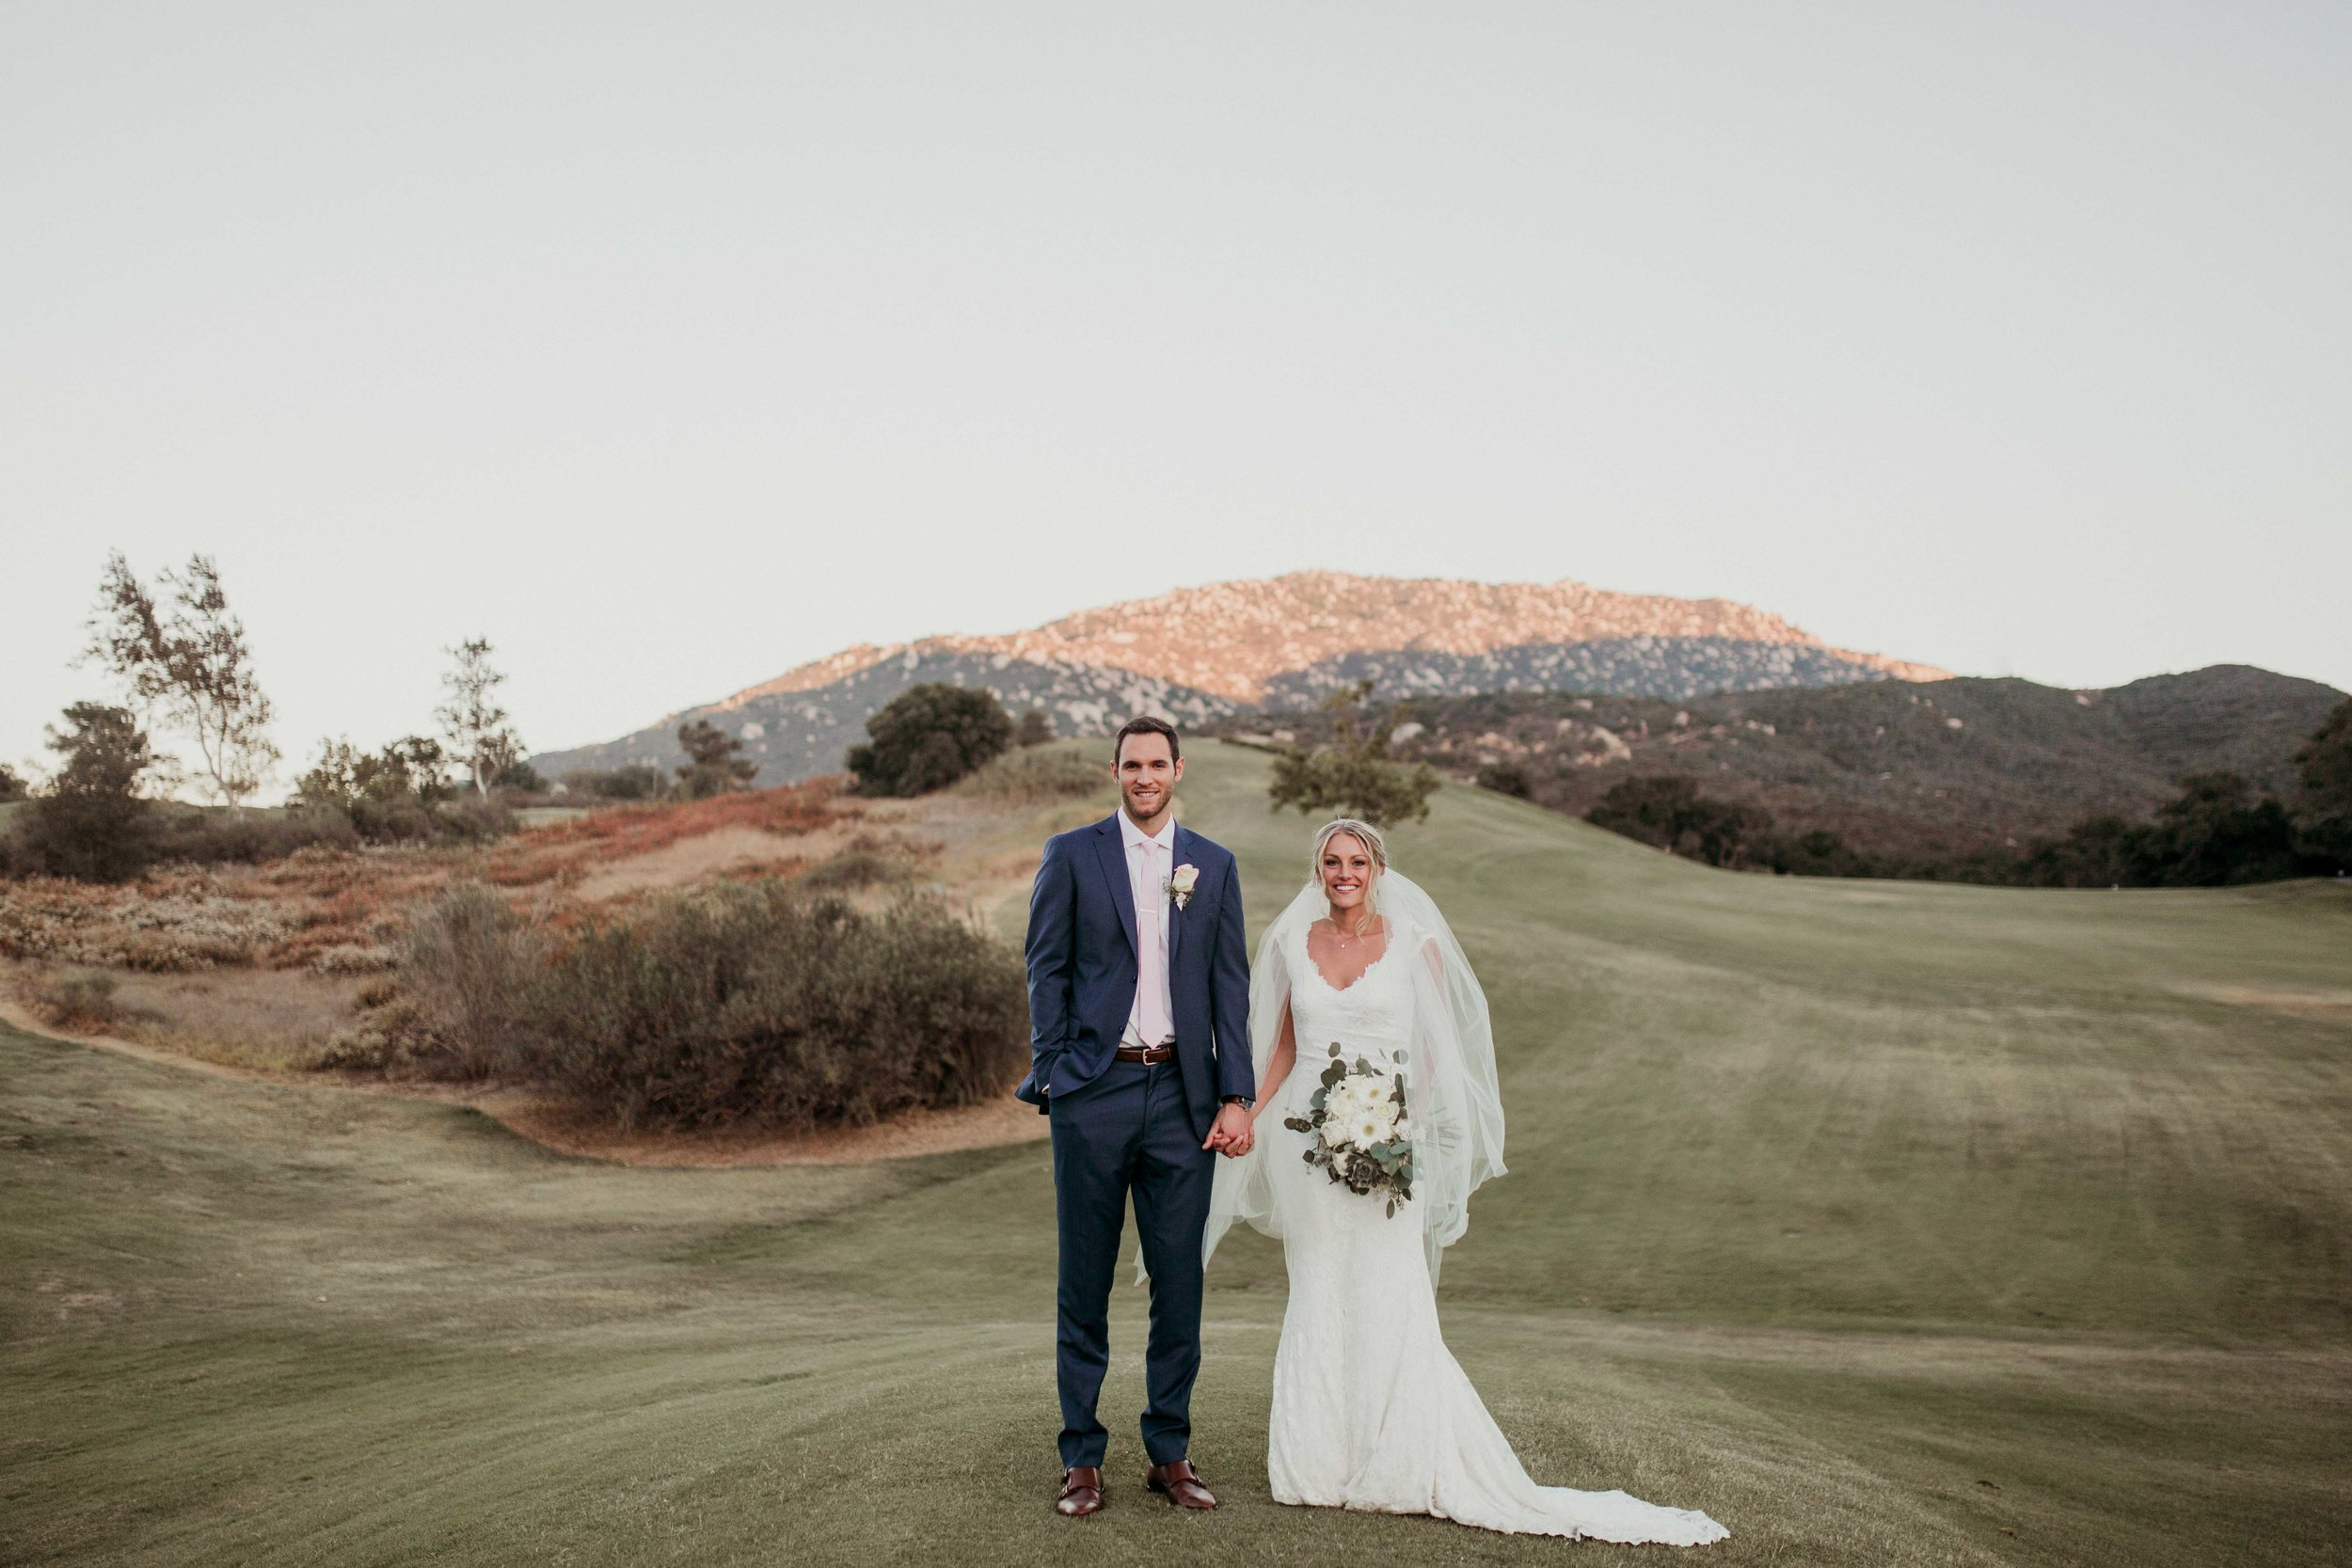 Salt-Lake-City-Wedding-Photographer-46.jpg